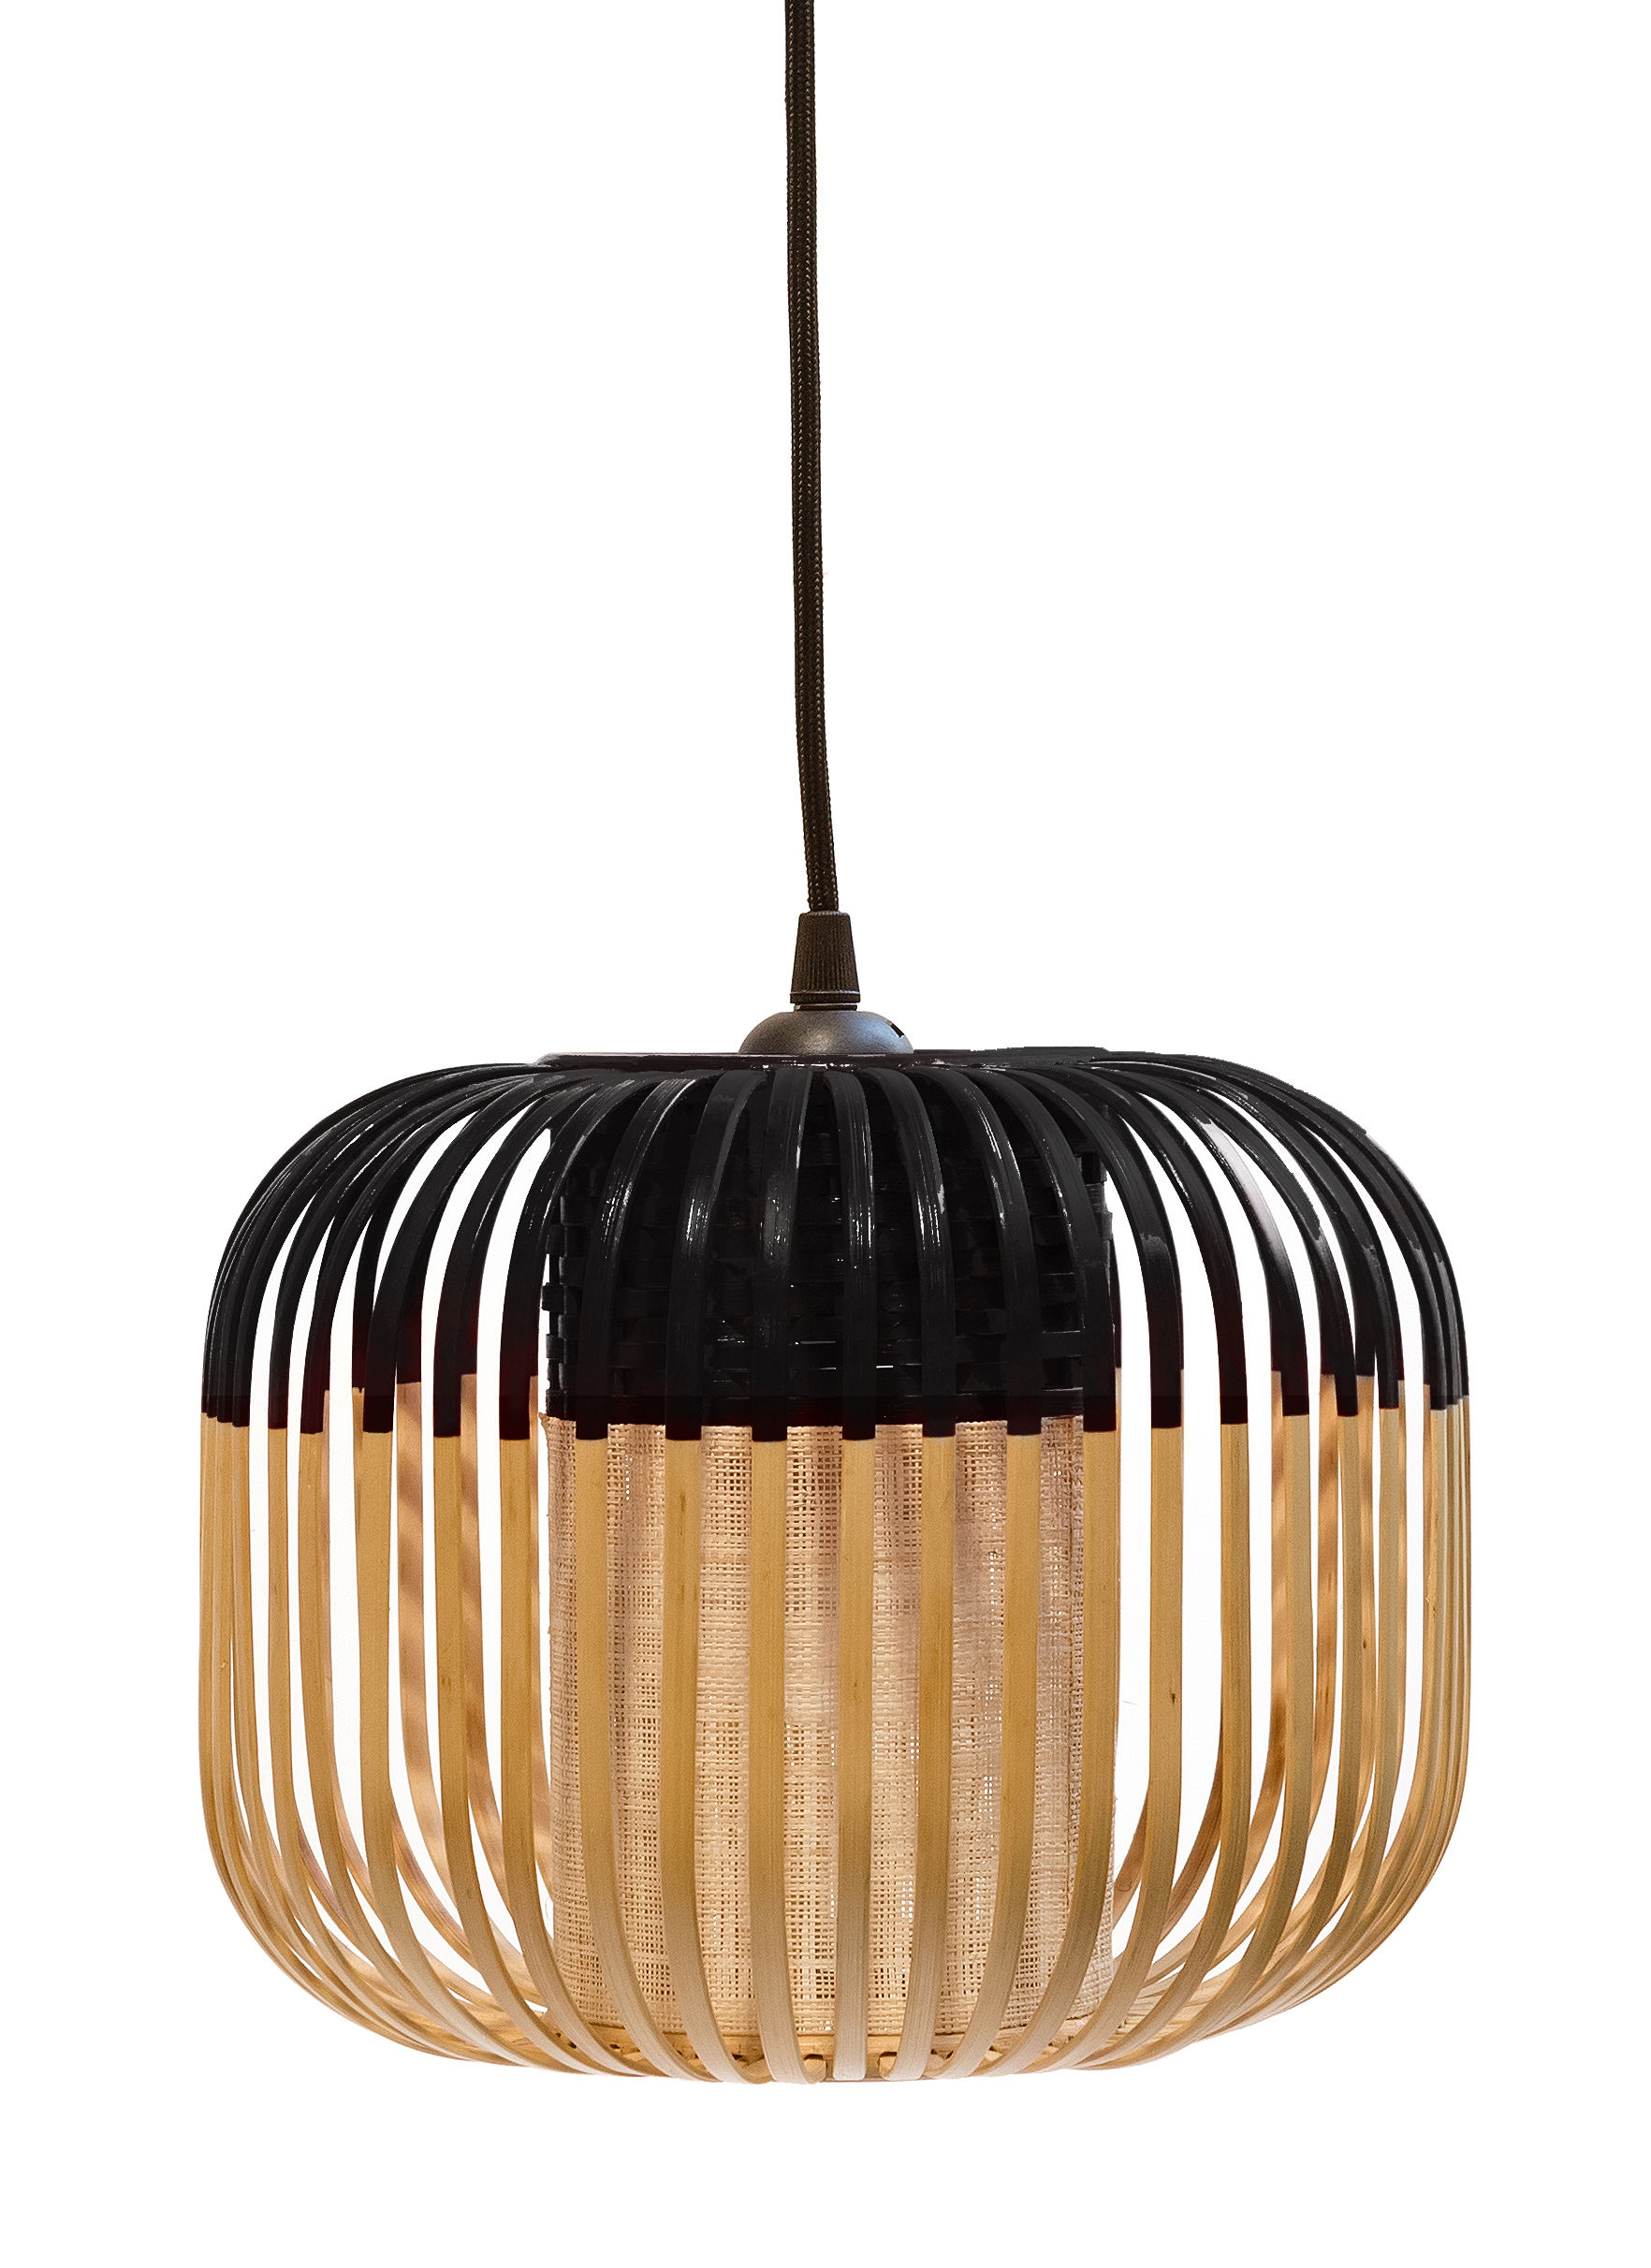 Lighting - Pendant Lighting - Bamboo Light XS Pendant - H 20 x Ø 27 cm by Forestier - Black / Natural - Fabric, Metal, Natural bamboo